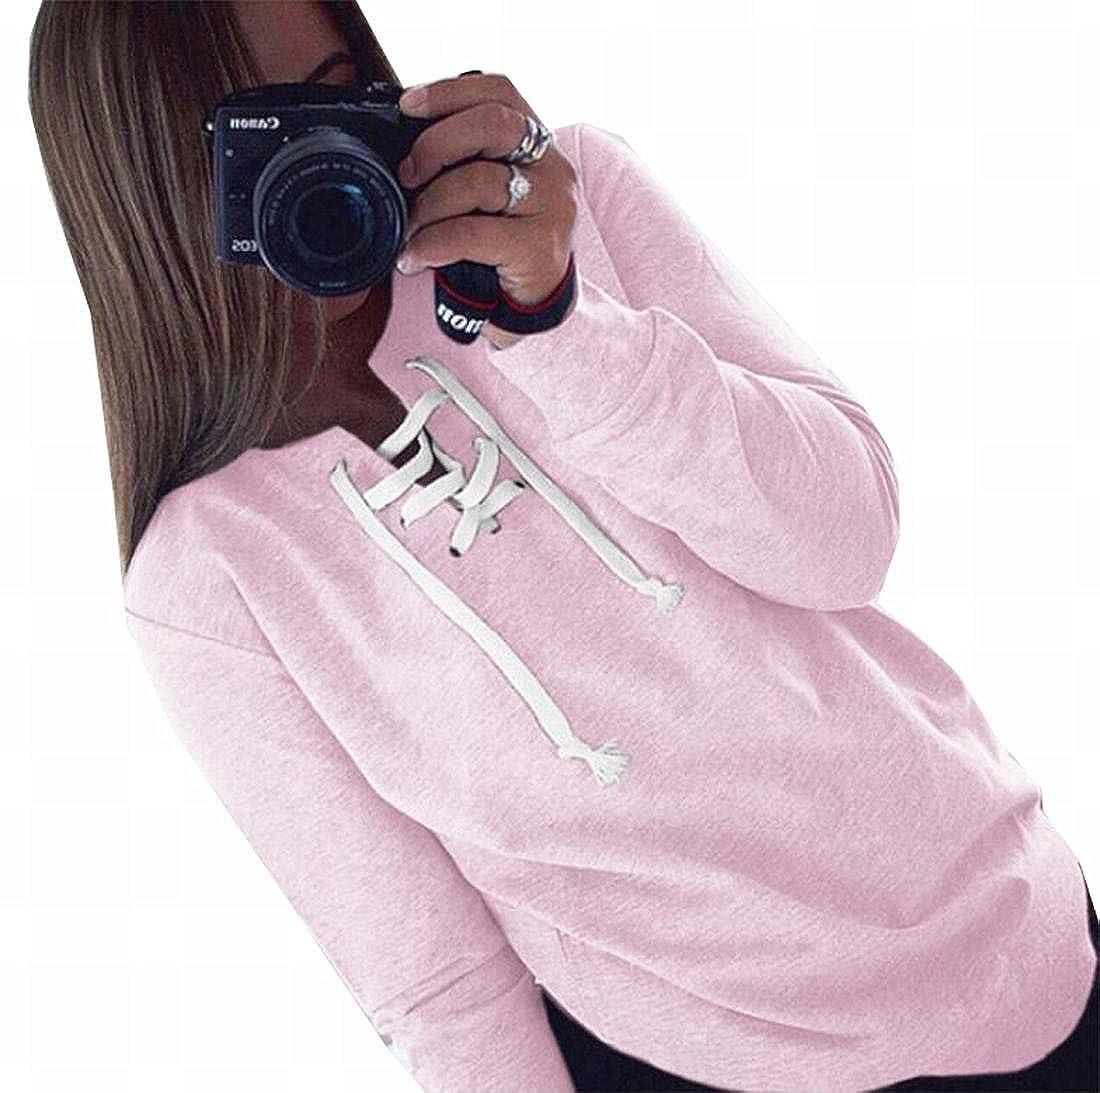 Womens Round Neck Warm Sweatshirts Long Sleeve Bandage Casual Outfits